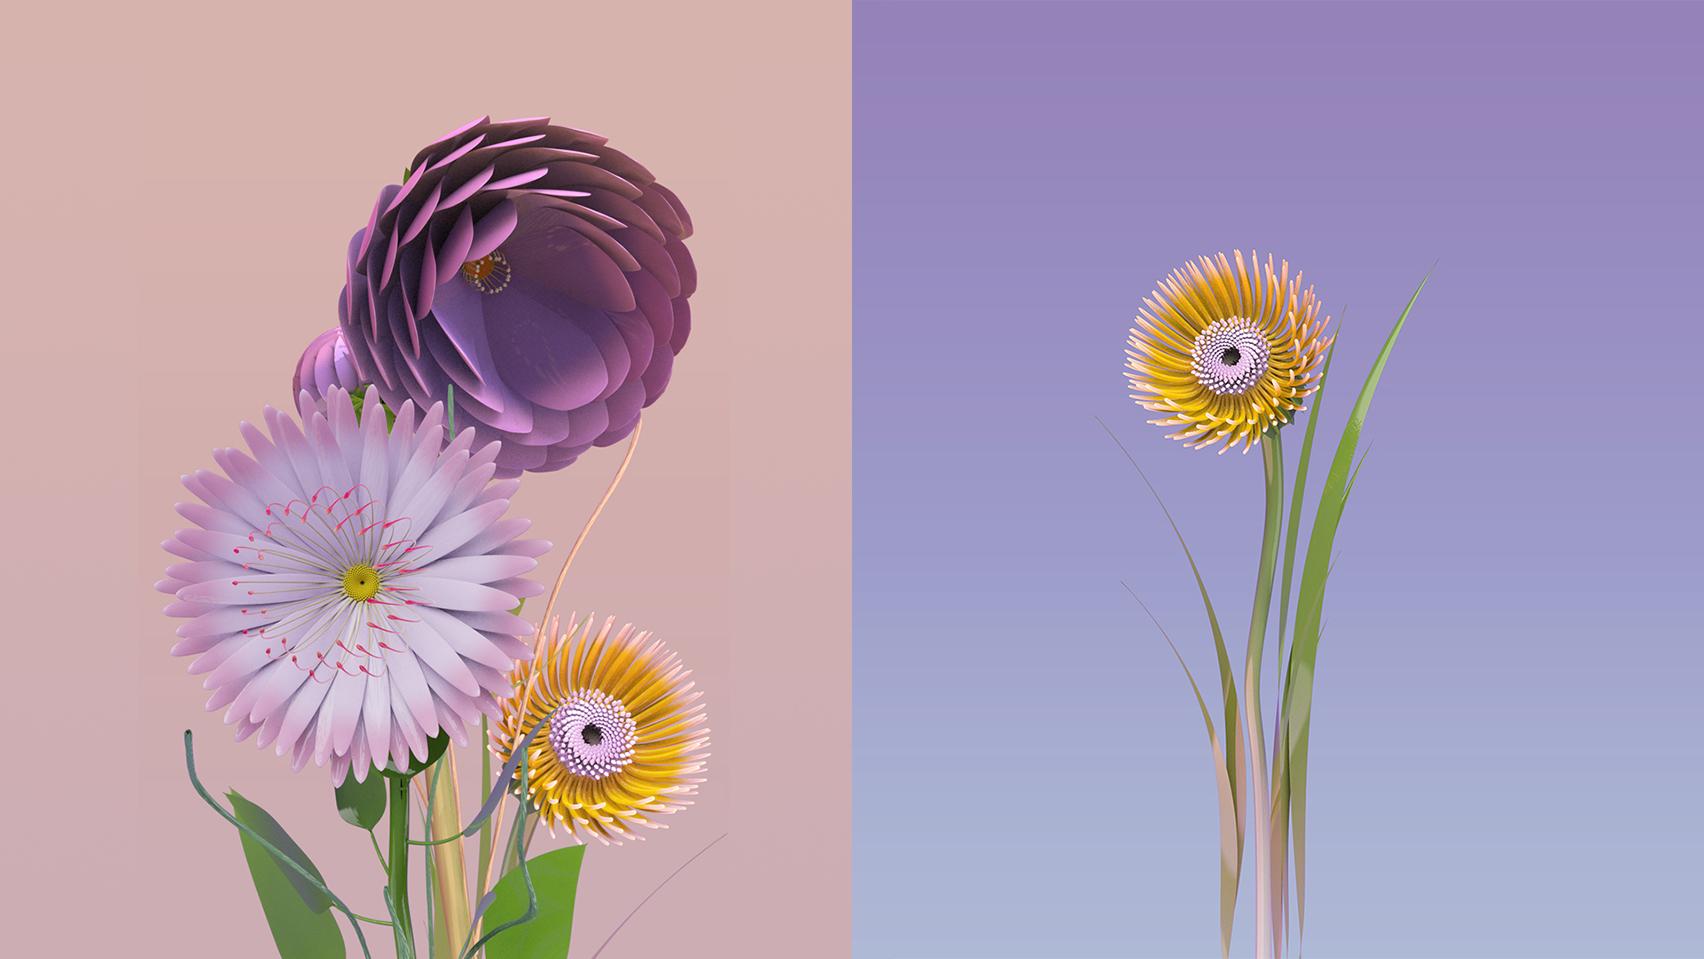 Garden Of Galaxy Wallpaper Wins Samsung Mobile Design